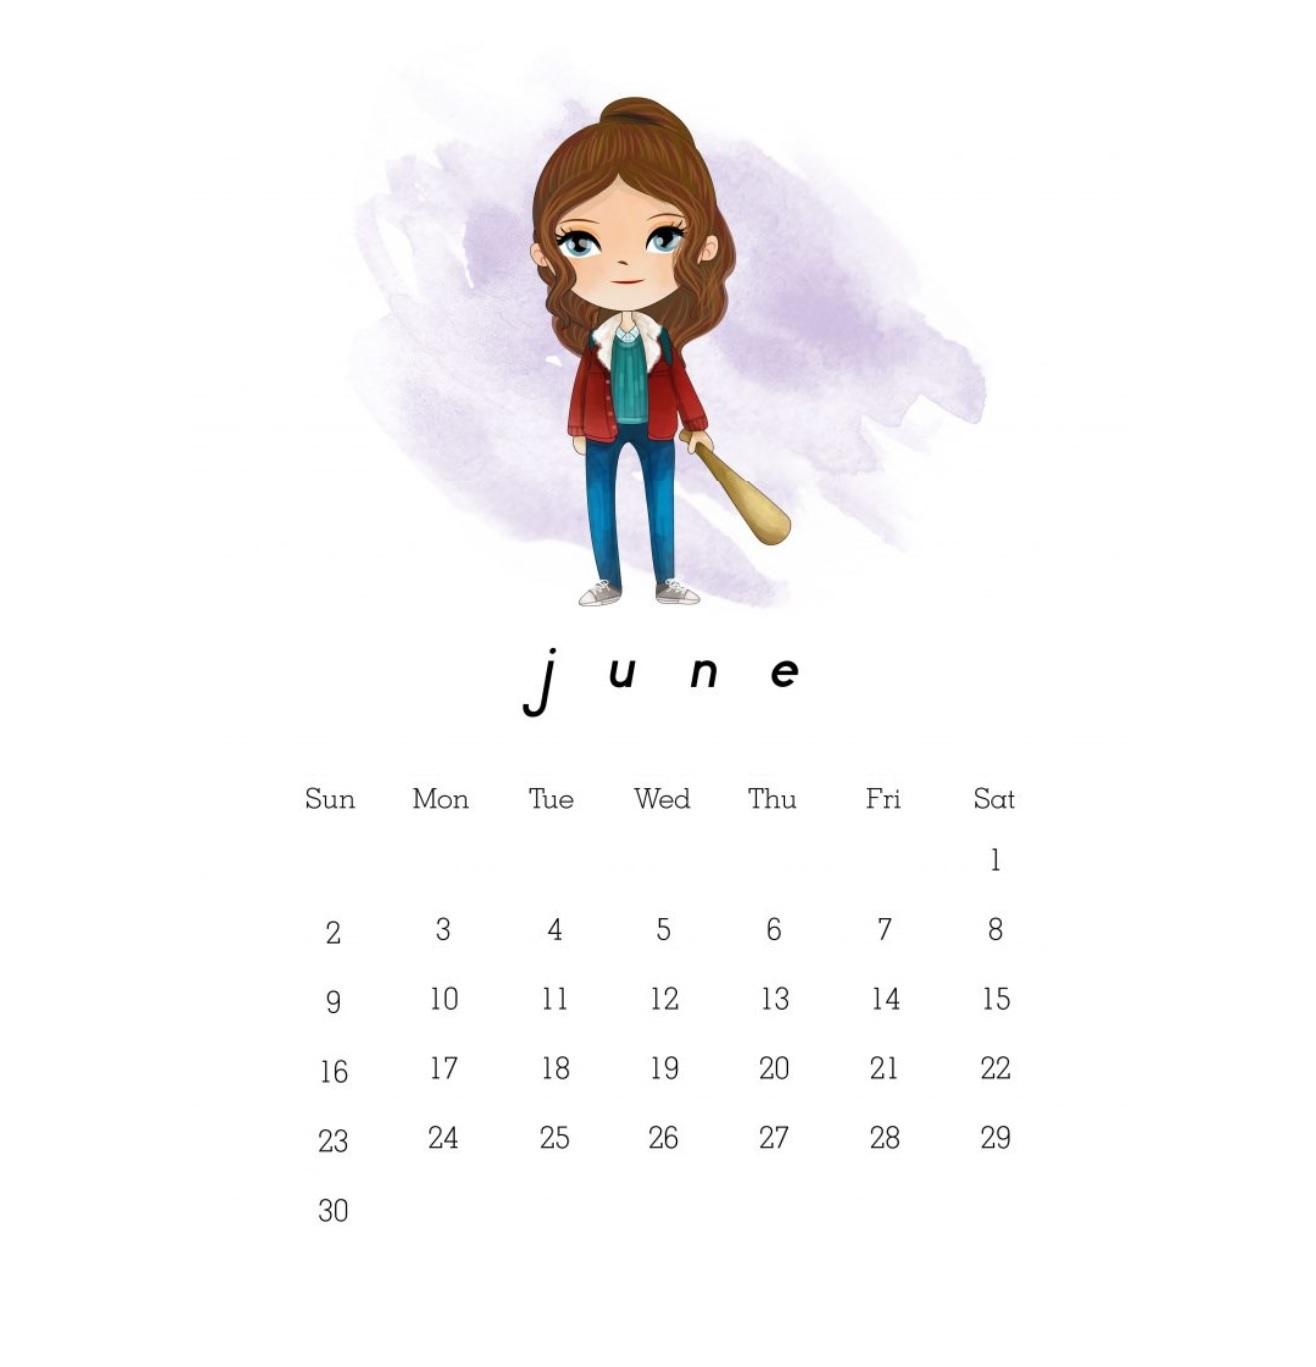 Cute June 2019 Calendar for Kids